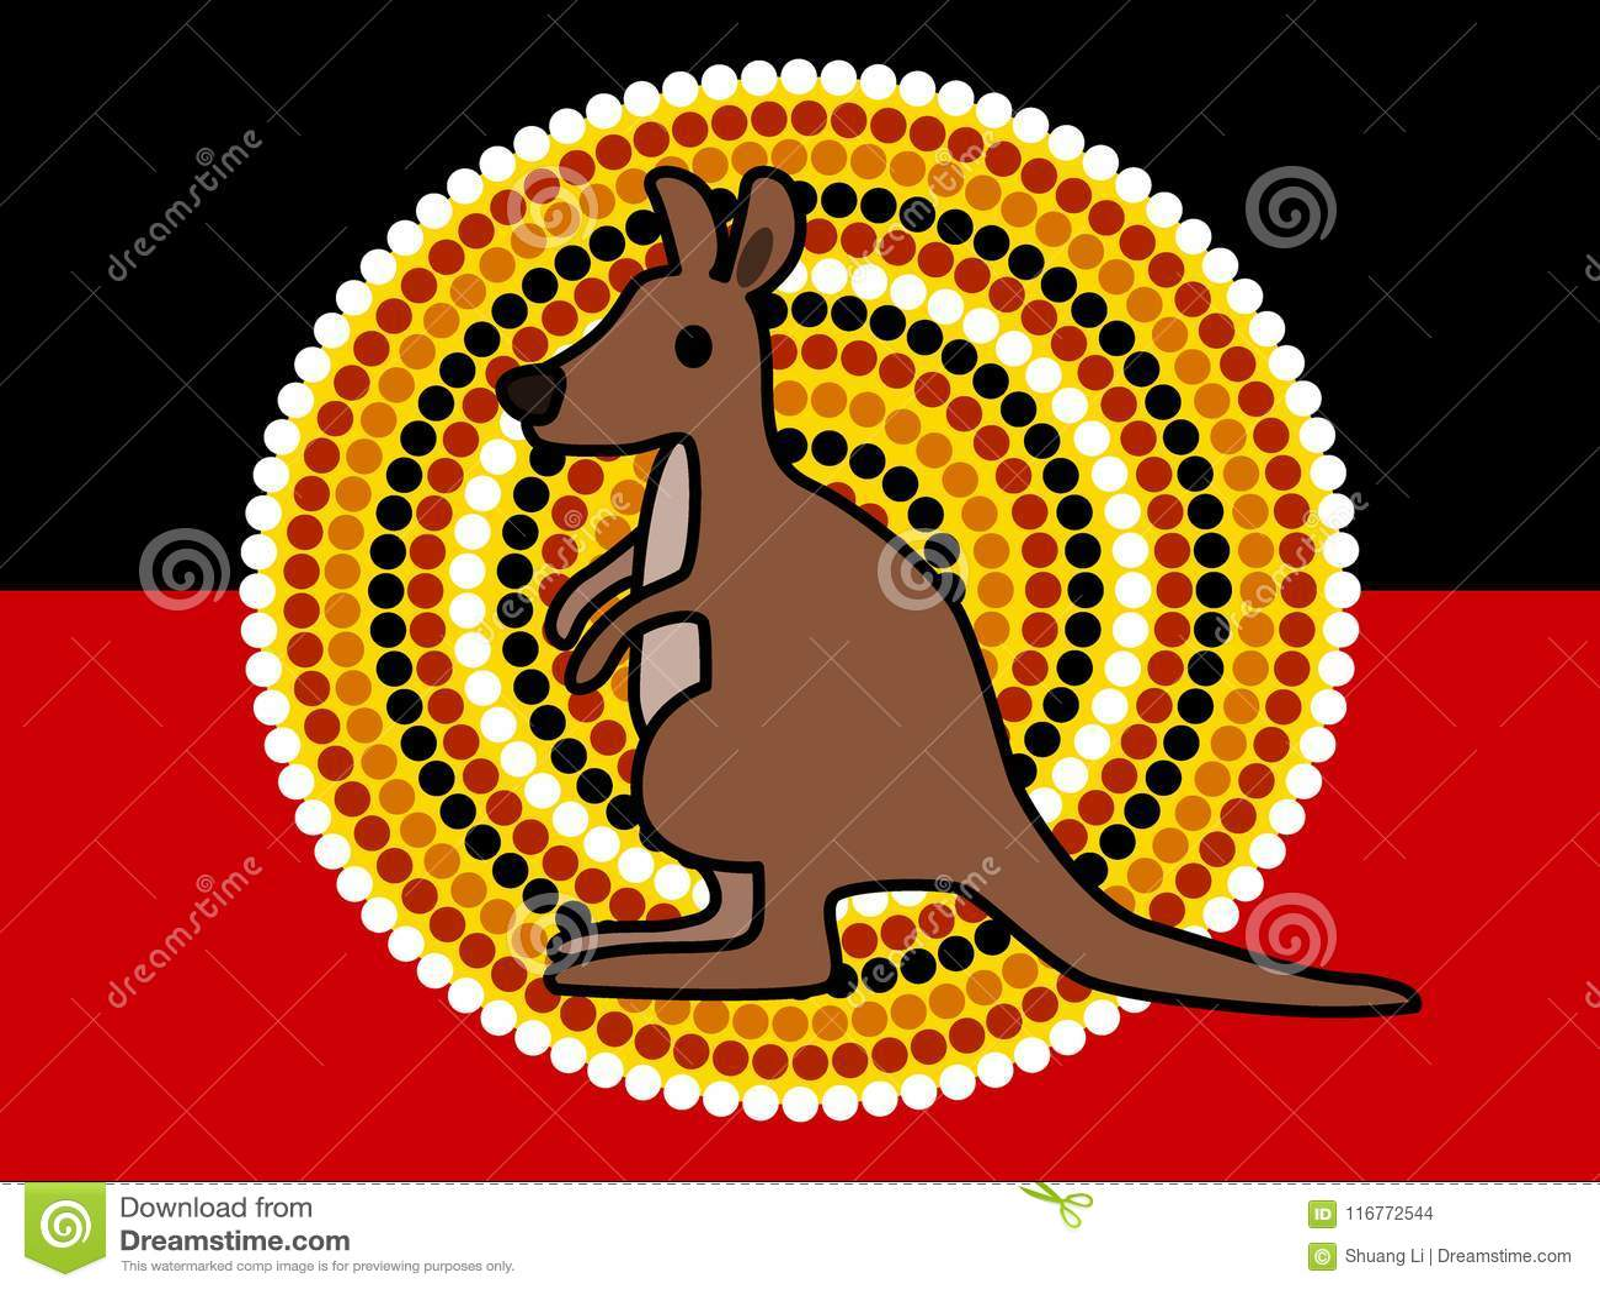 Cute Kangaroo And Australian Aboriginal Flag Stock Illustration